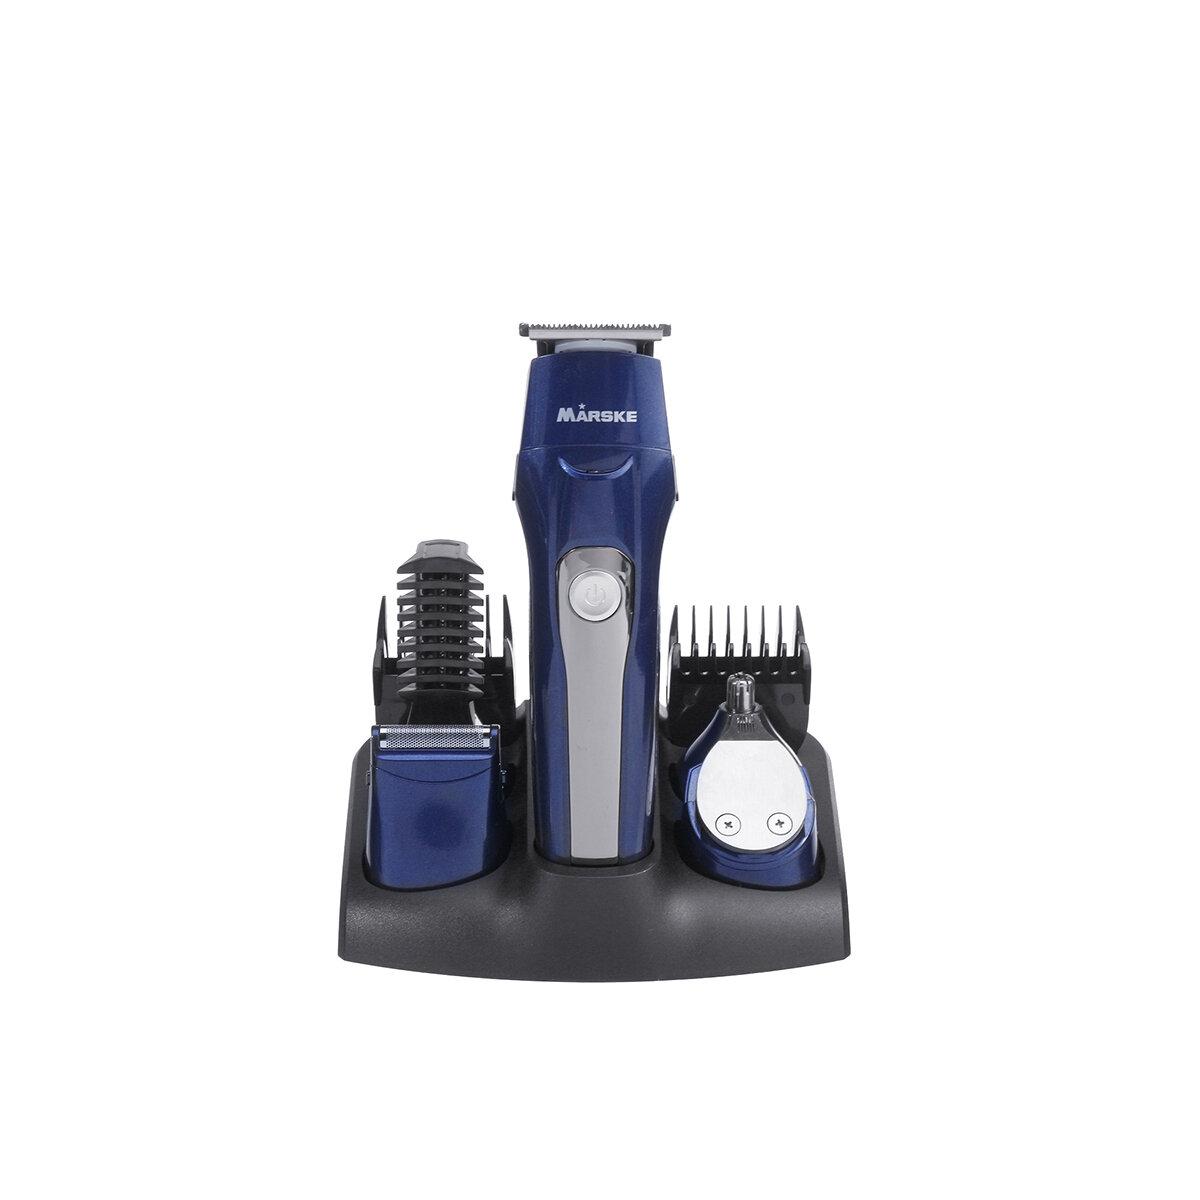 5 В 1 Электрический Волосы Clipper Аккумуляторная Нос Триммер Борода Бритва Стрижка Набор фото